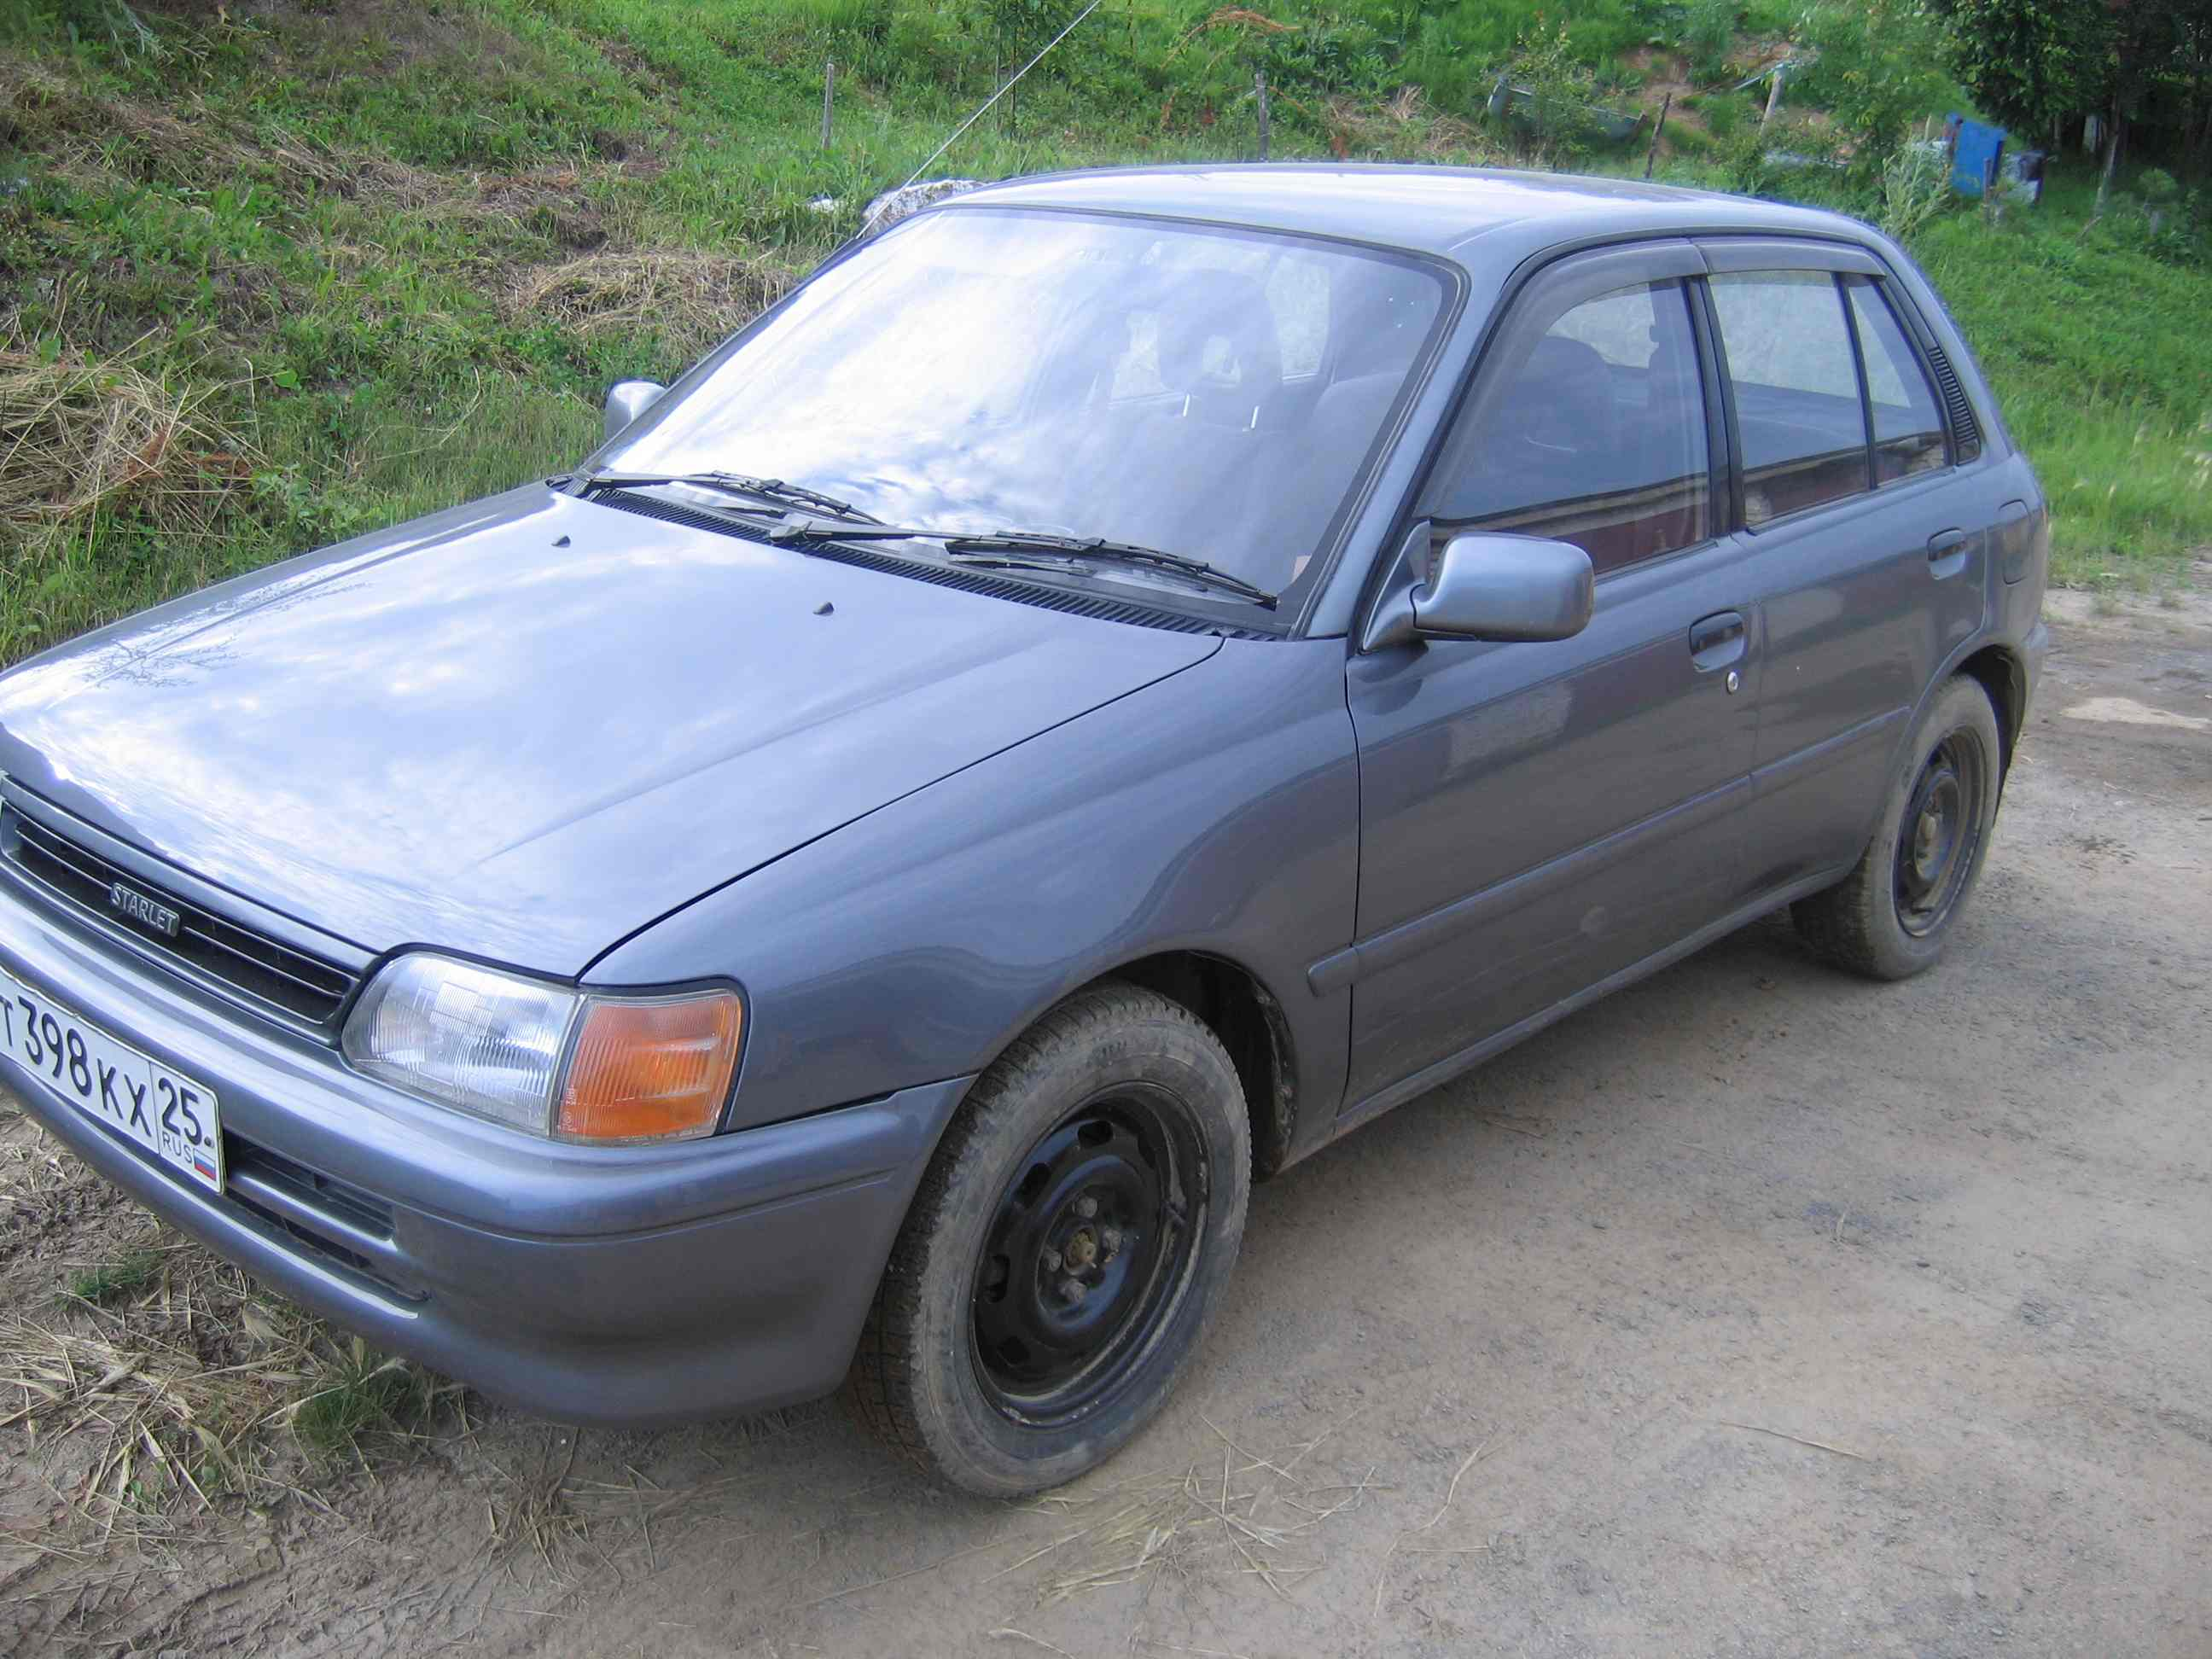 1990 Toyota Starlet Specs  Engine Size 1300cm3  Fuel Type Gasoline  Drive Wheels Ff